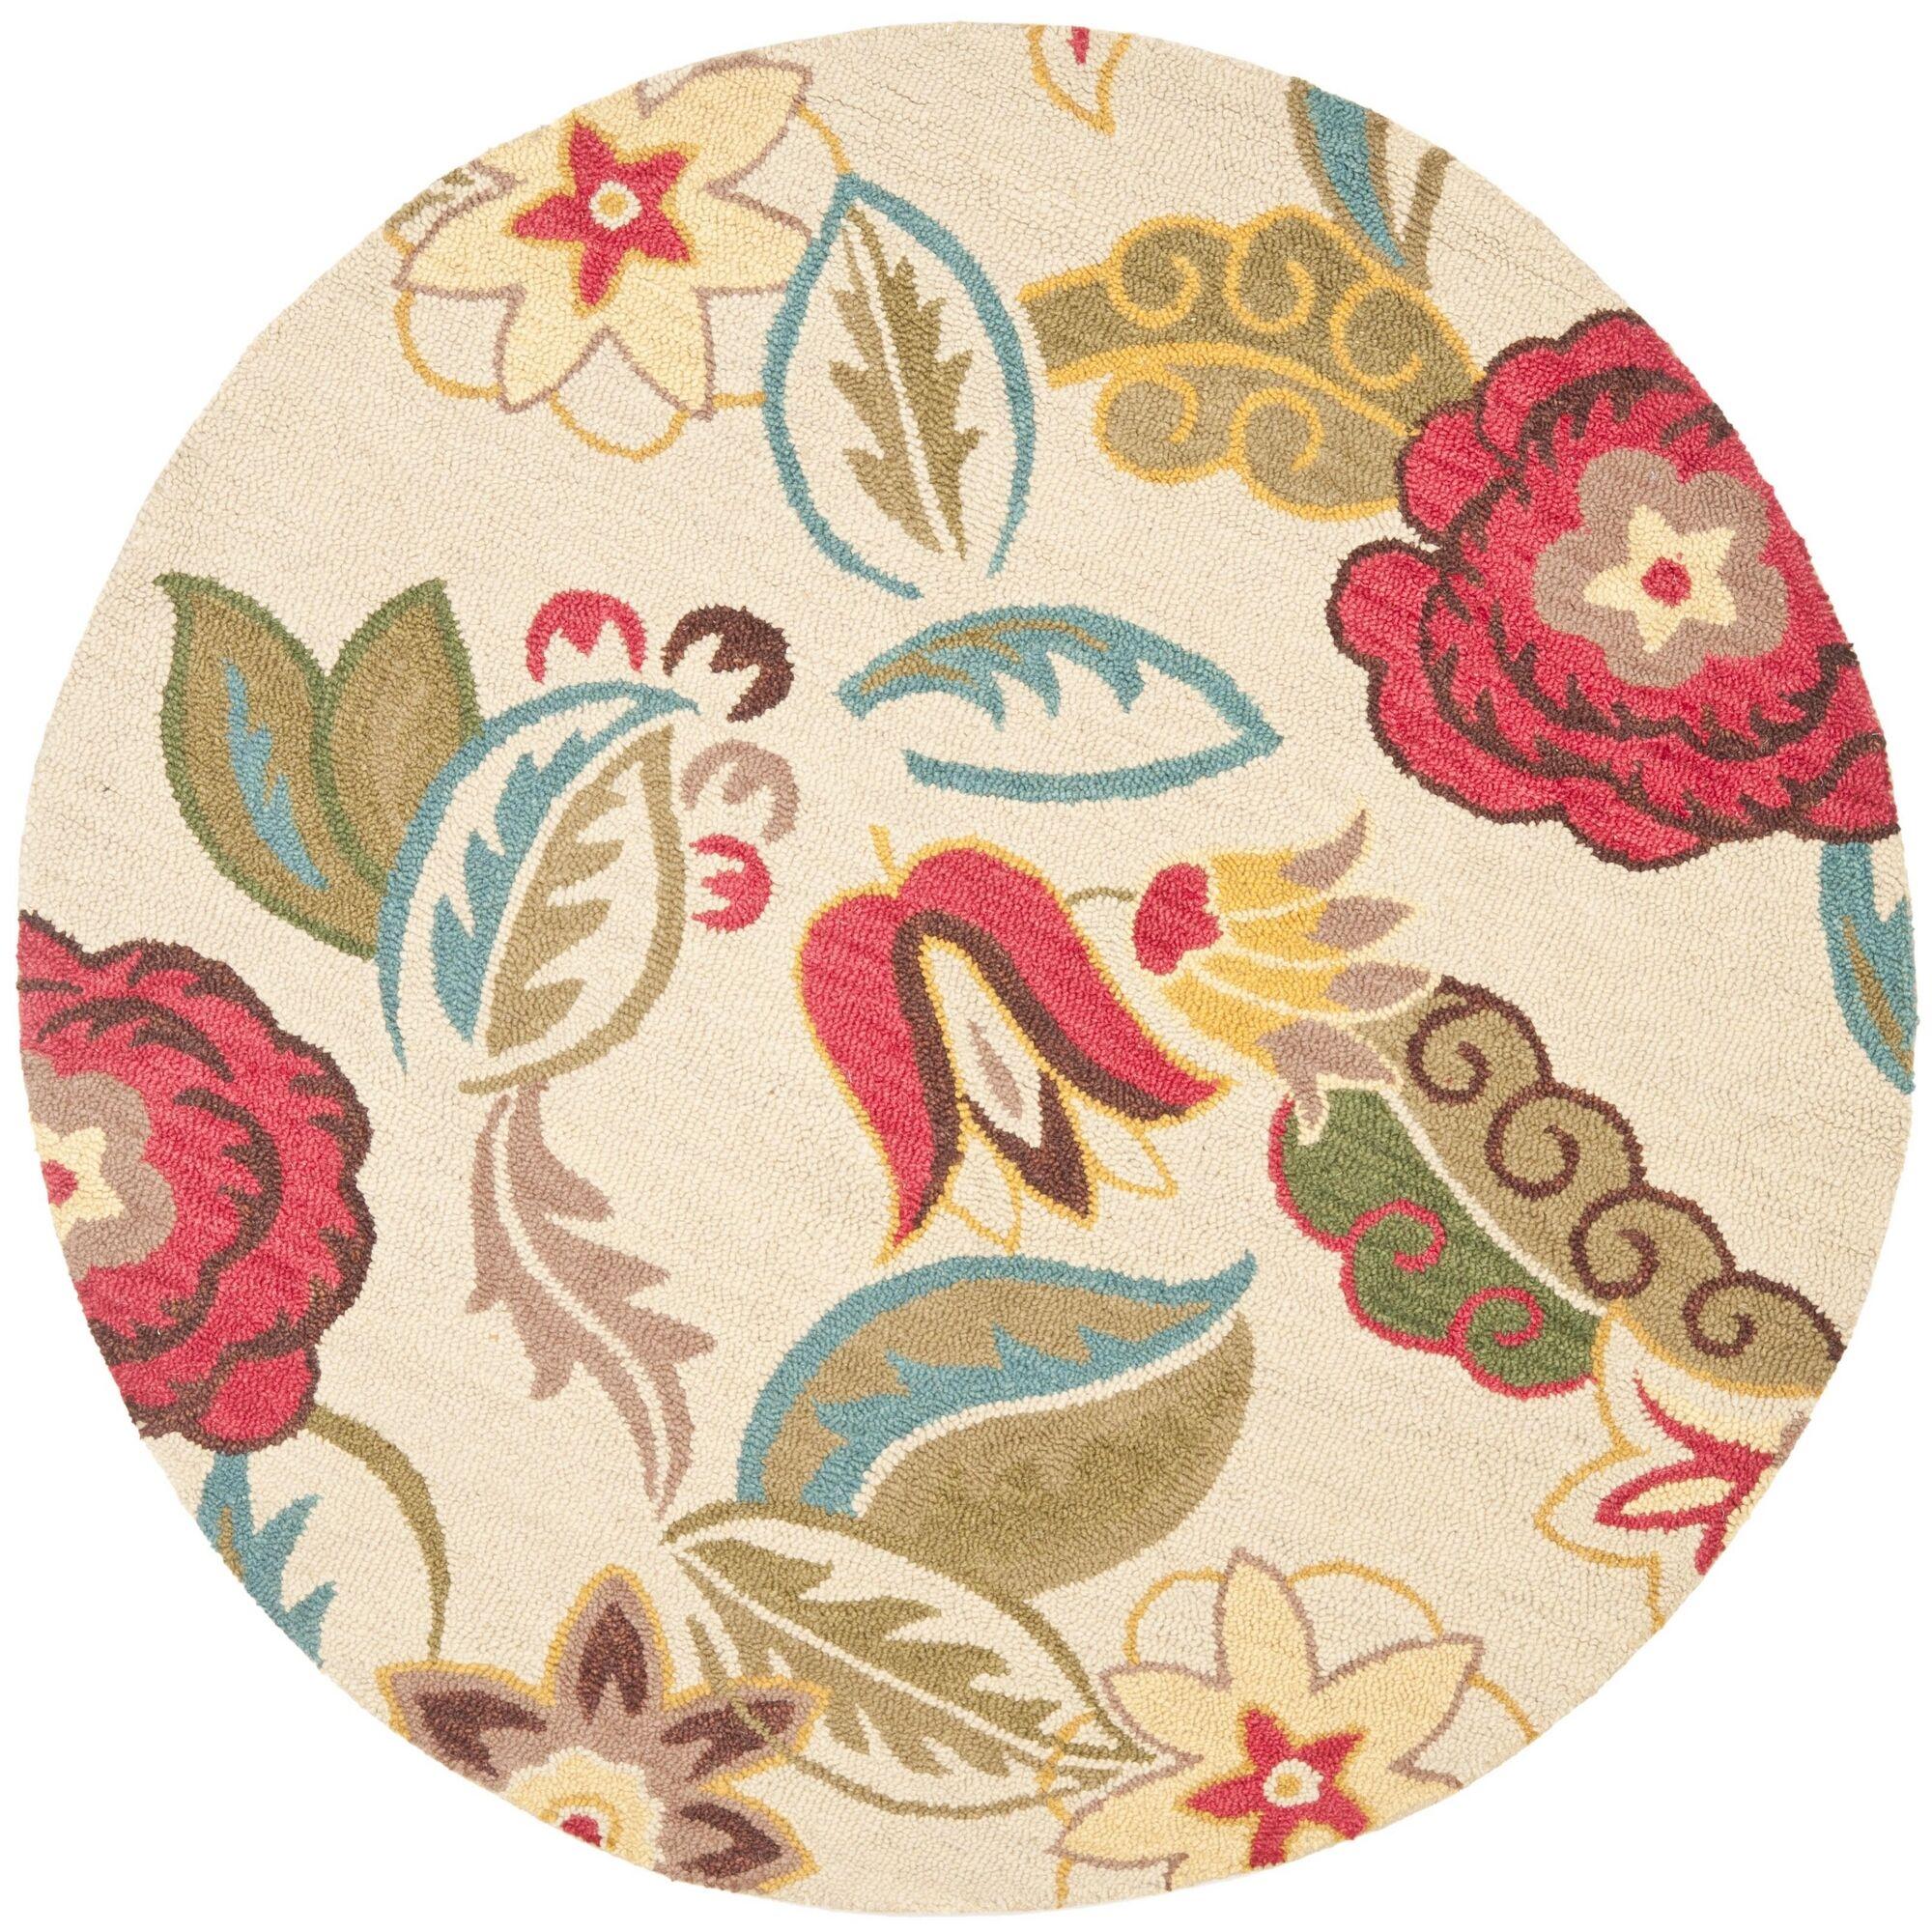 Ross Beige/Multi Floral Area Rug Rug Size: Rectangle 5' x 8'